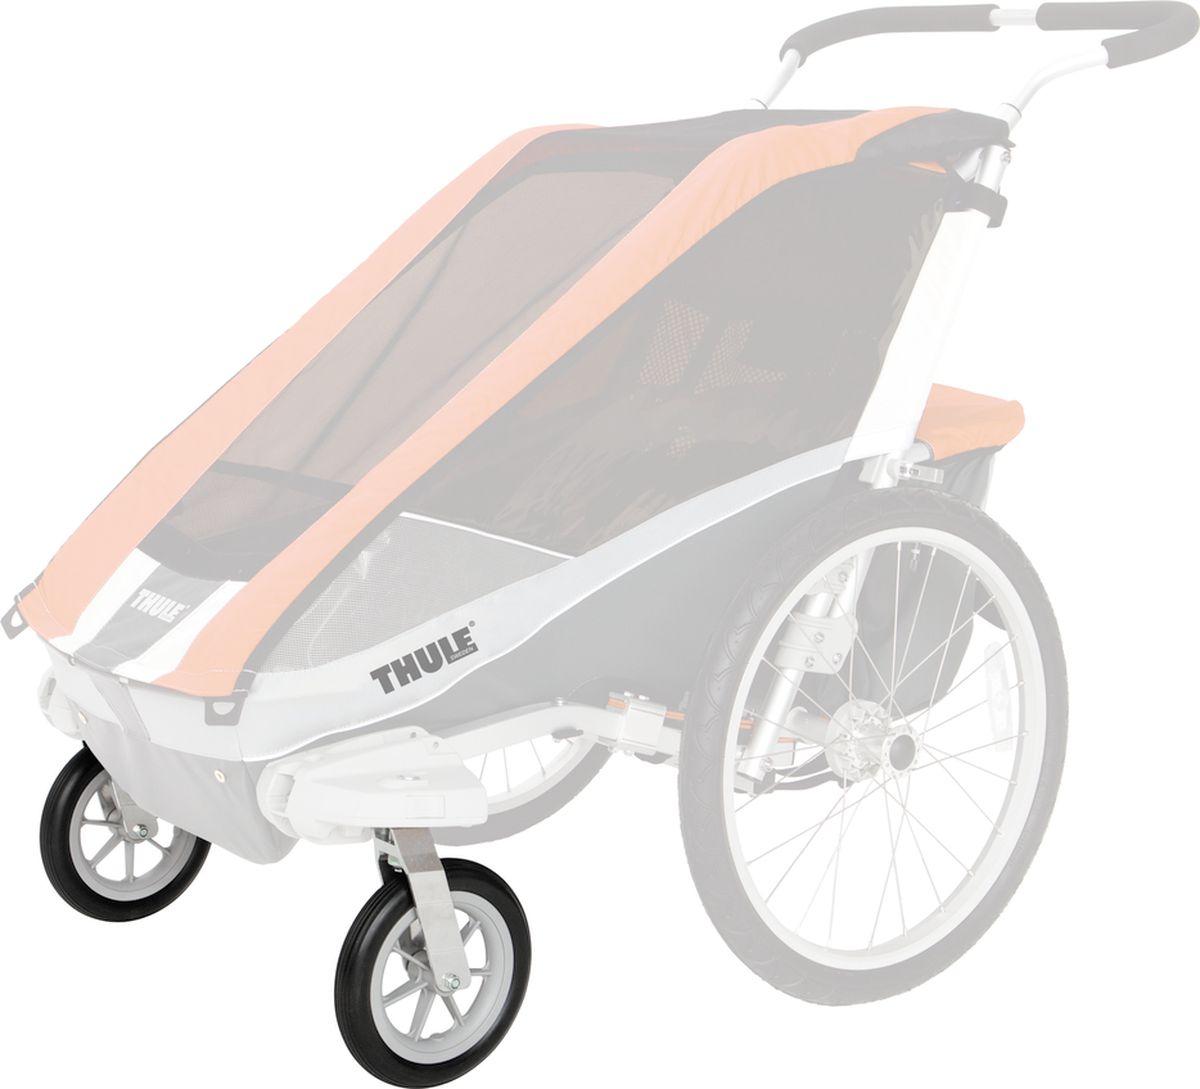 Thule Набор прогулочной коляски универсальный кроме Chinook (14-) thule 4064